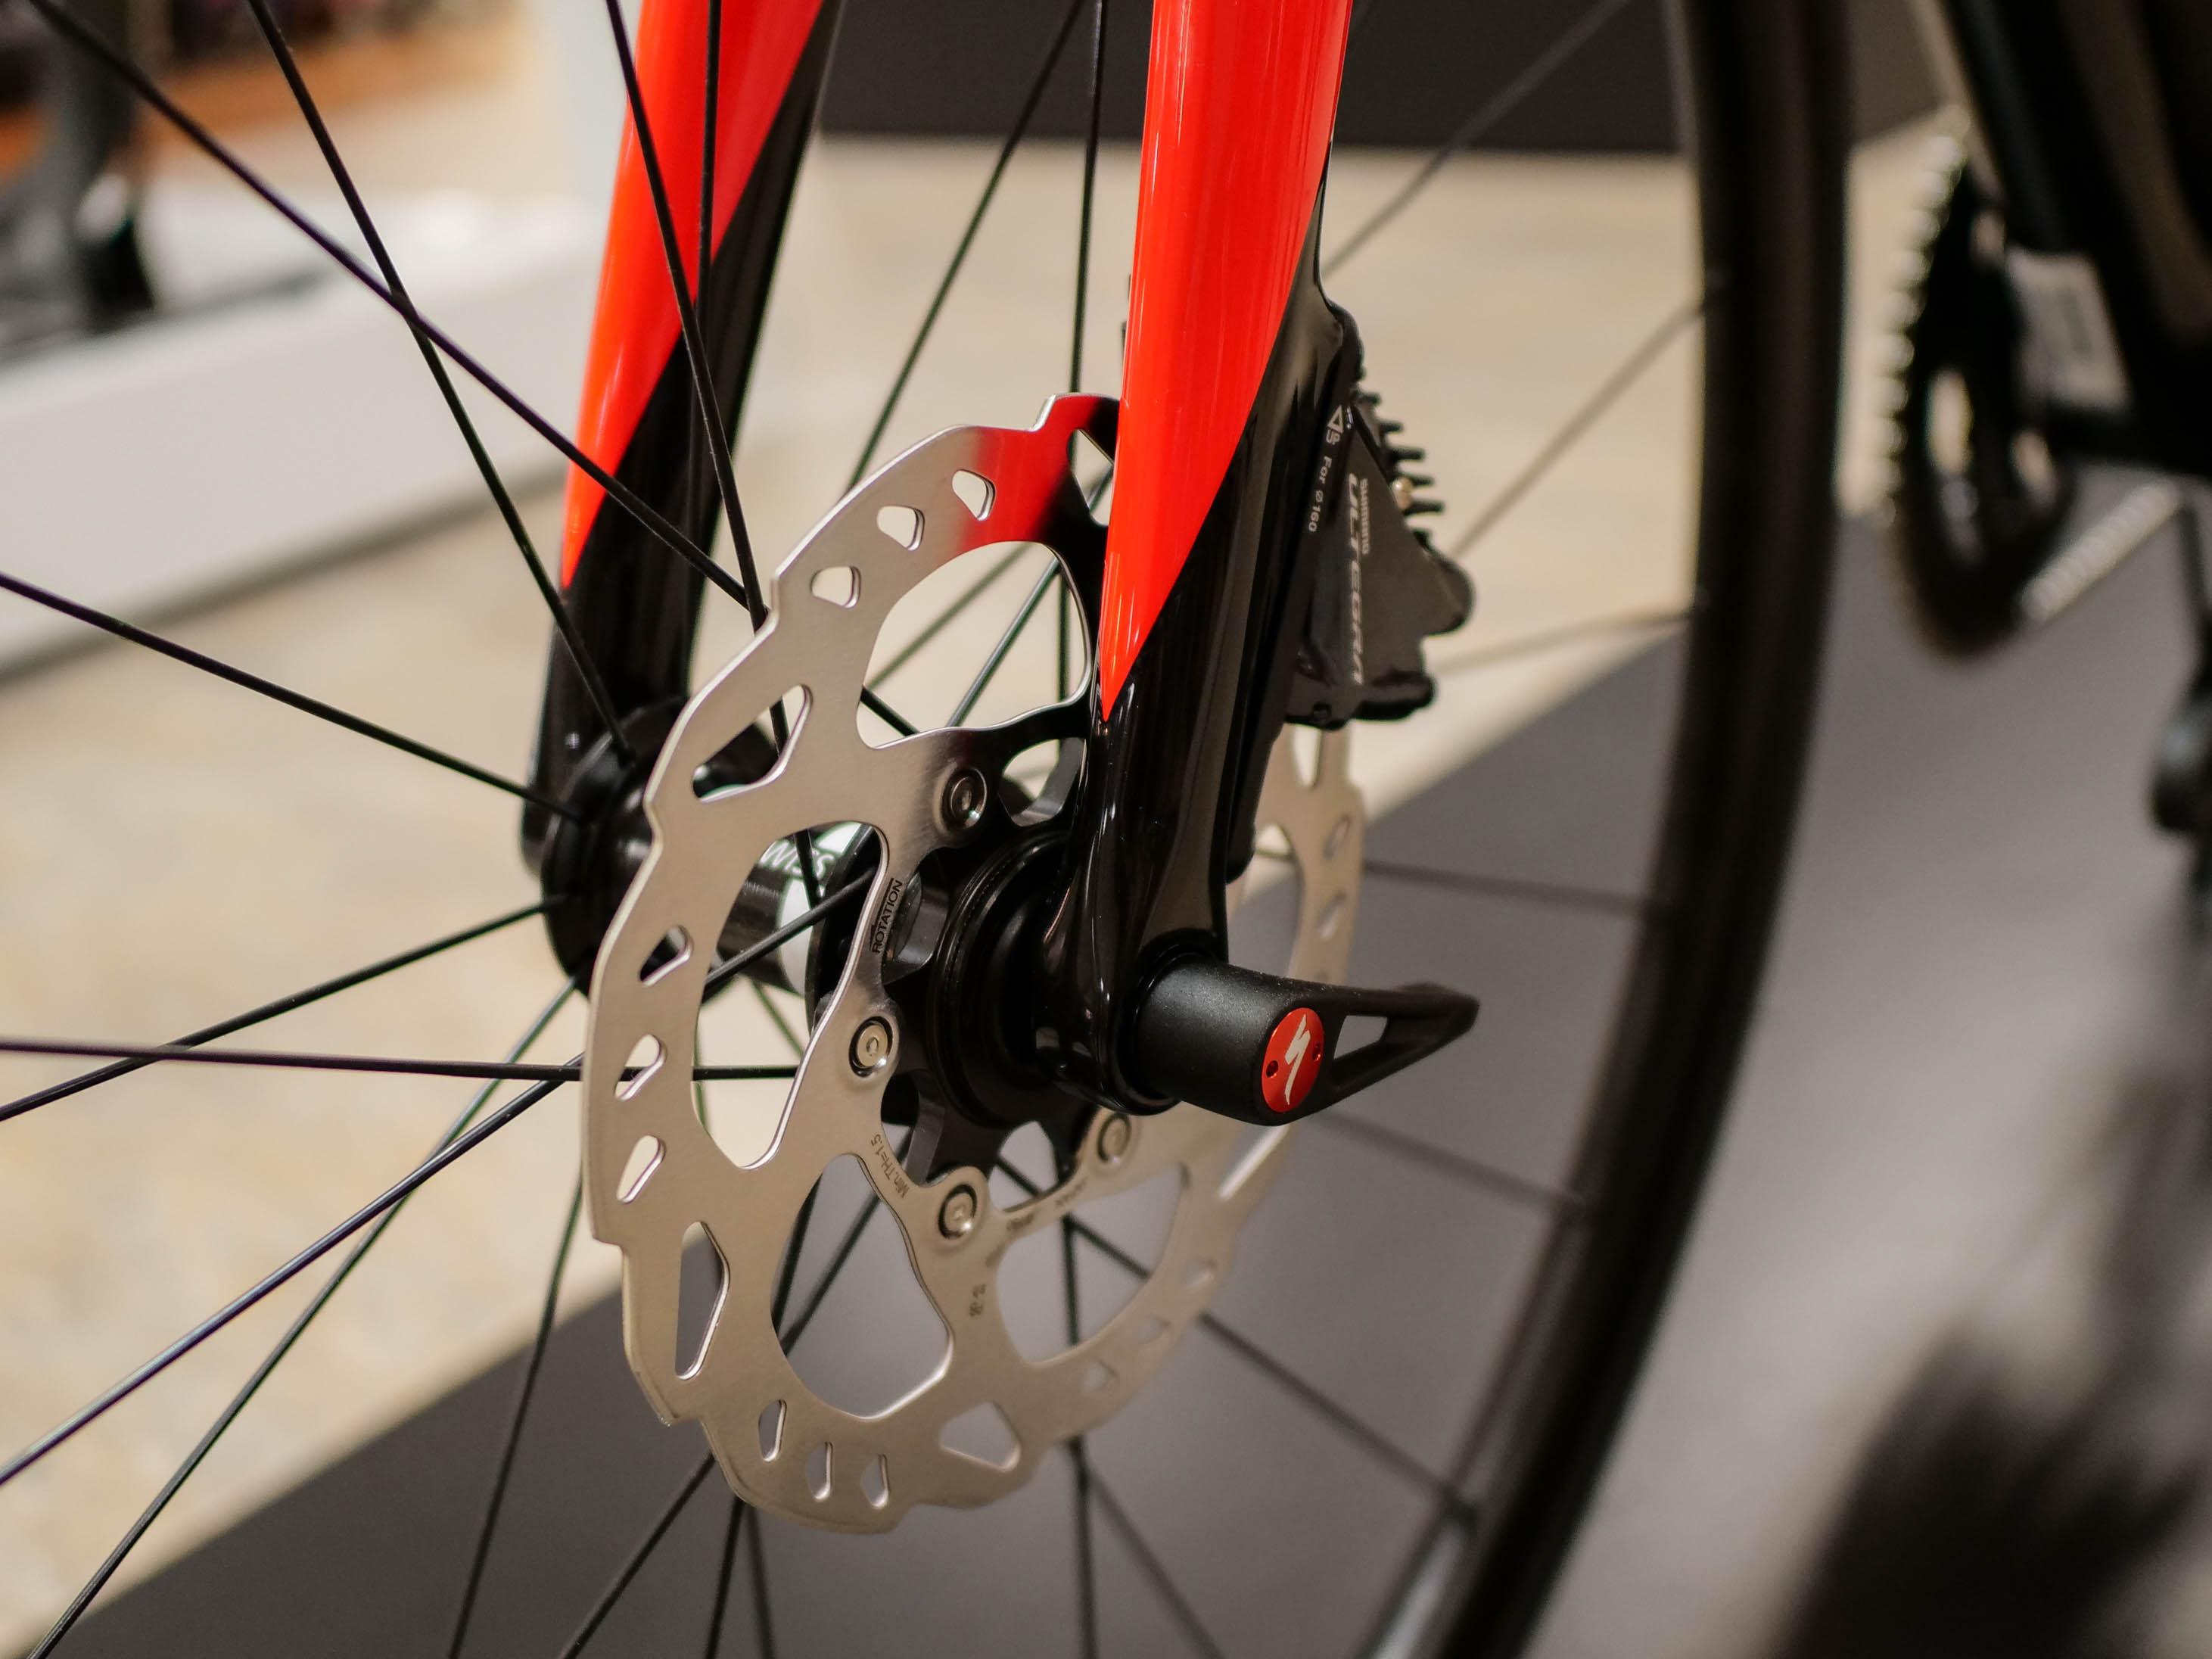 2018 Specialized Roubaix Expert Ultegra Di2 Specialized